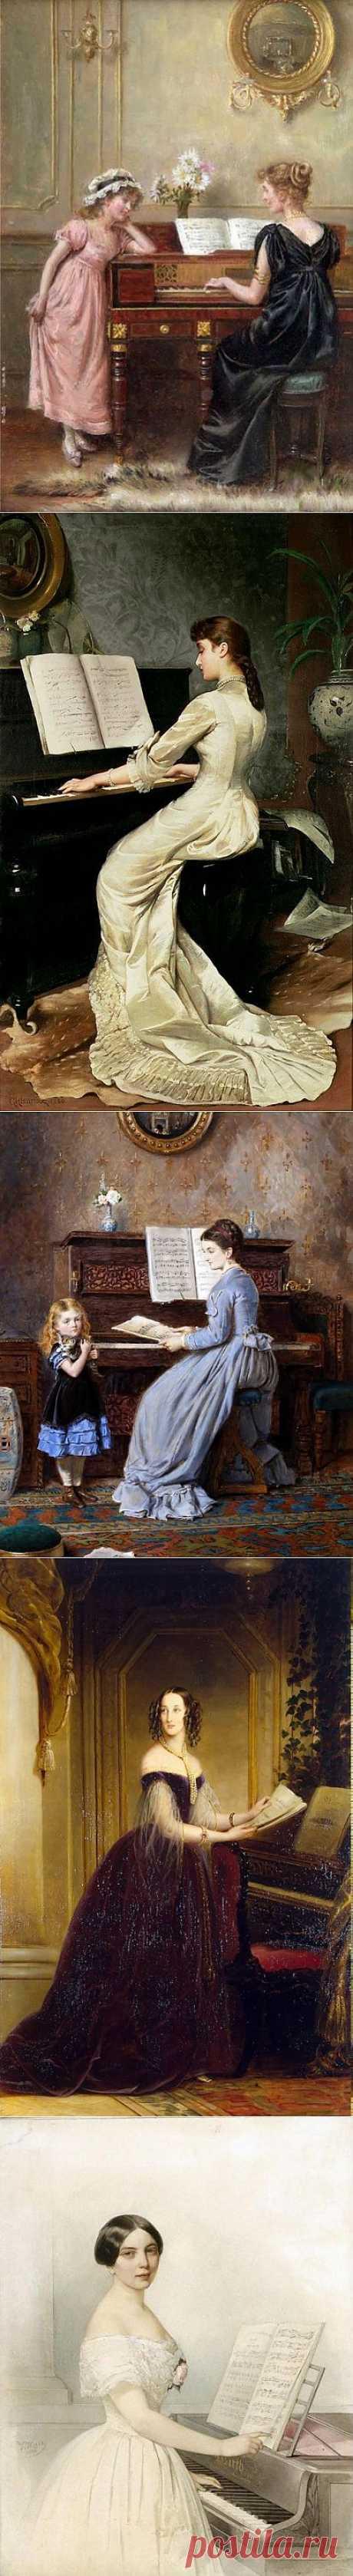 Леди за пианино. Живопись художников XVIII-XX веков.